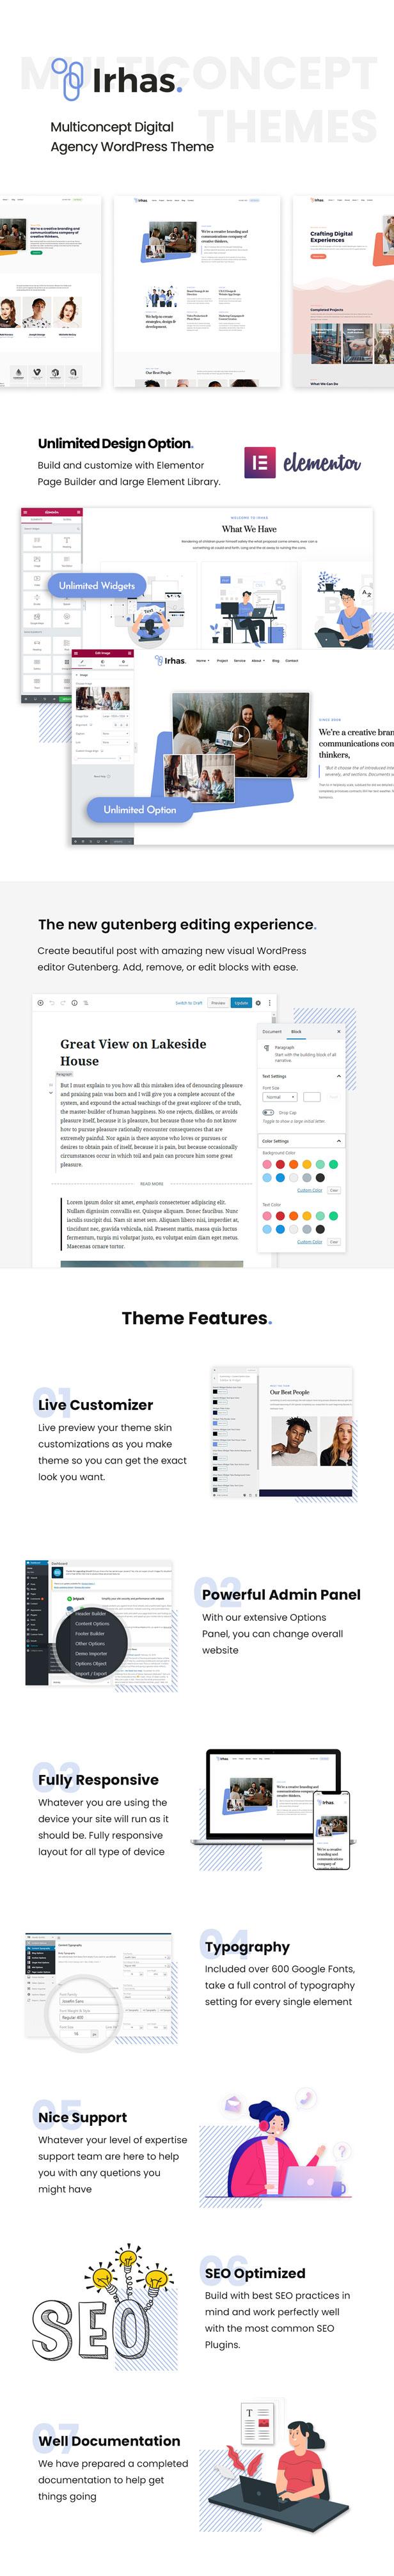 Irhas | Multi-concept Digital Agency WordPress Theme - 4